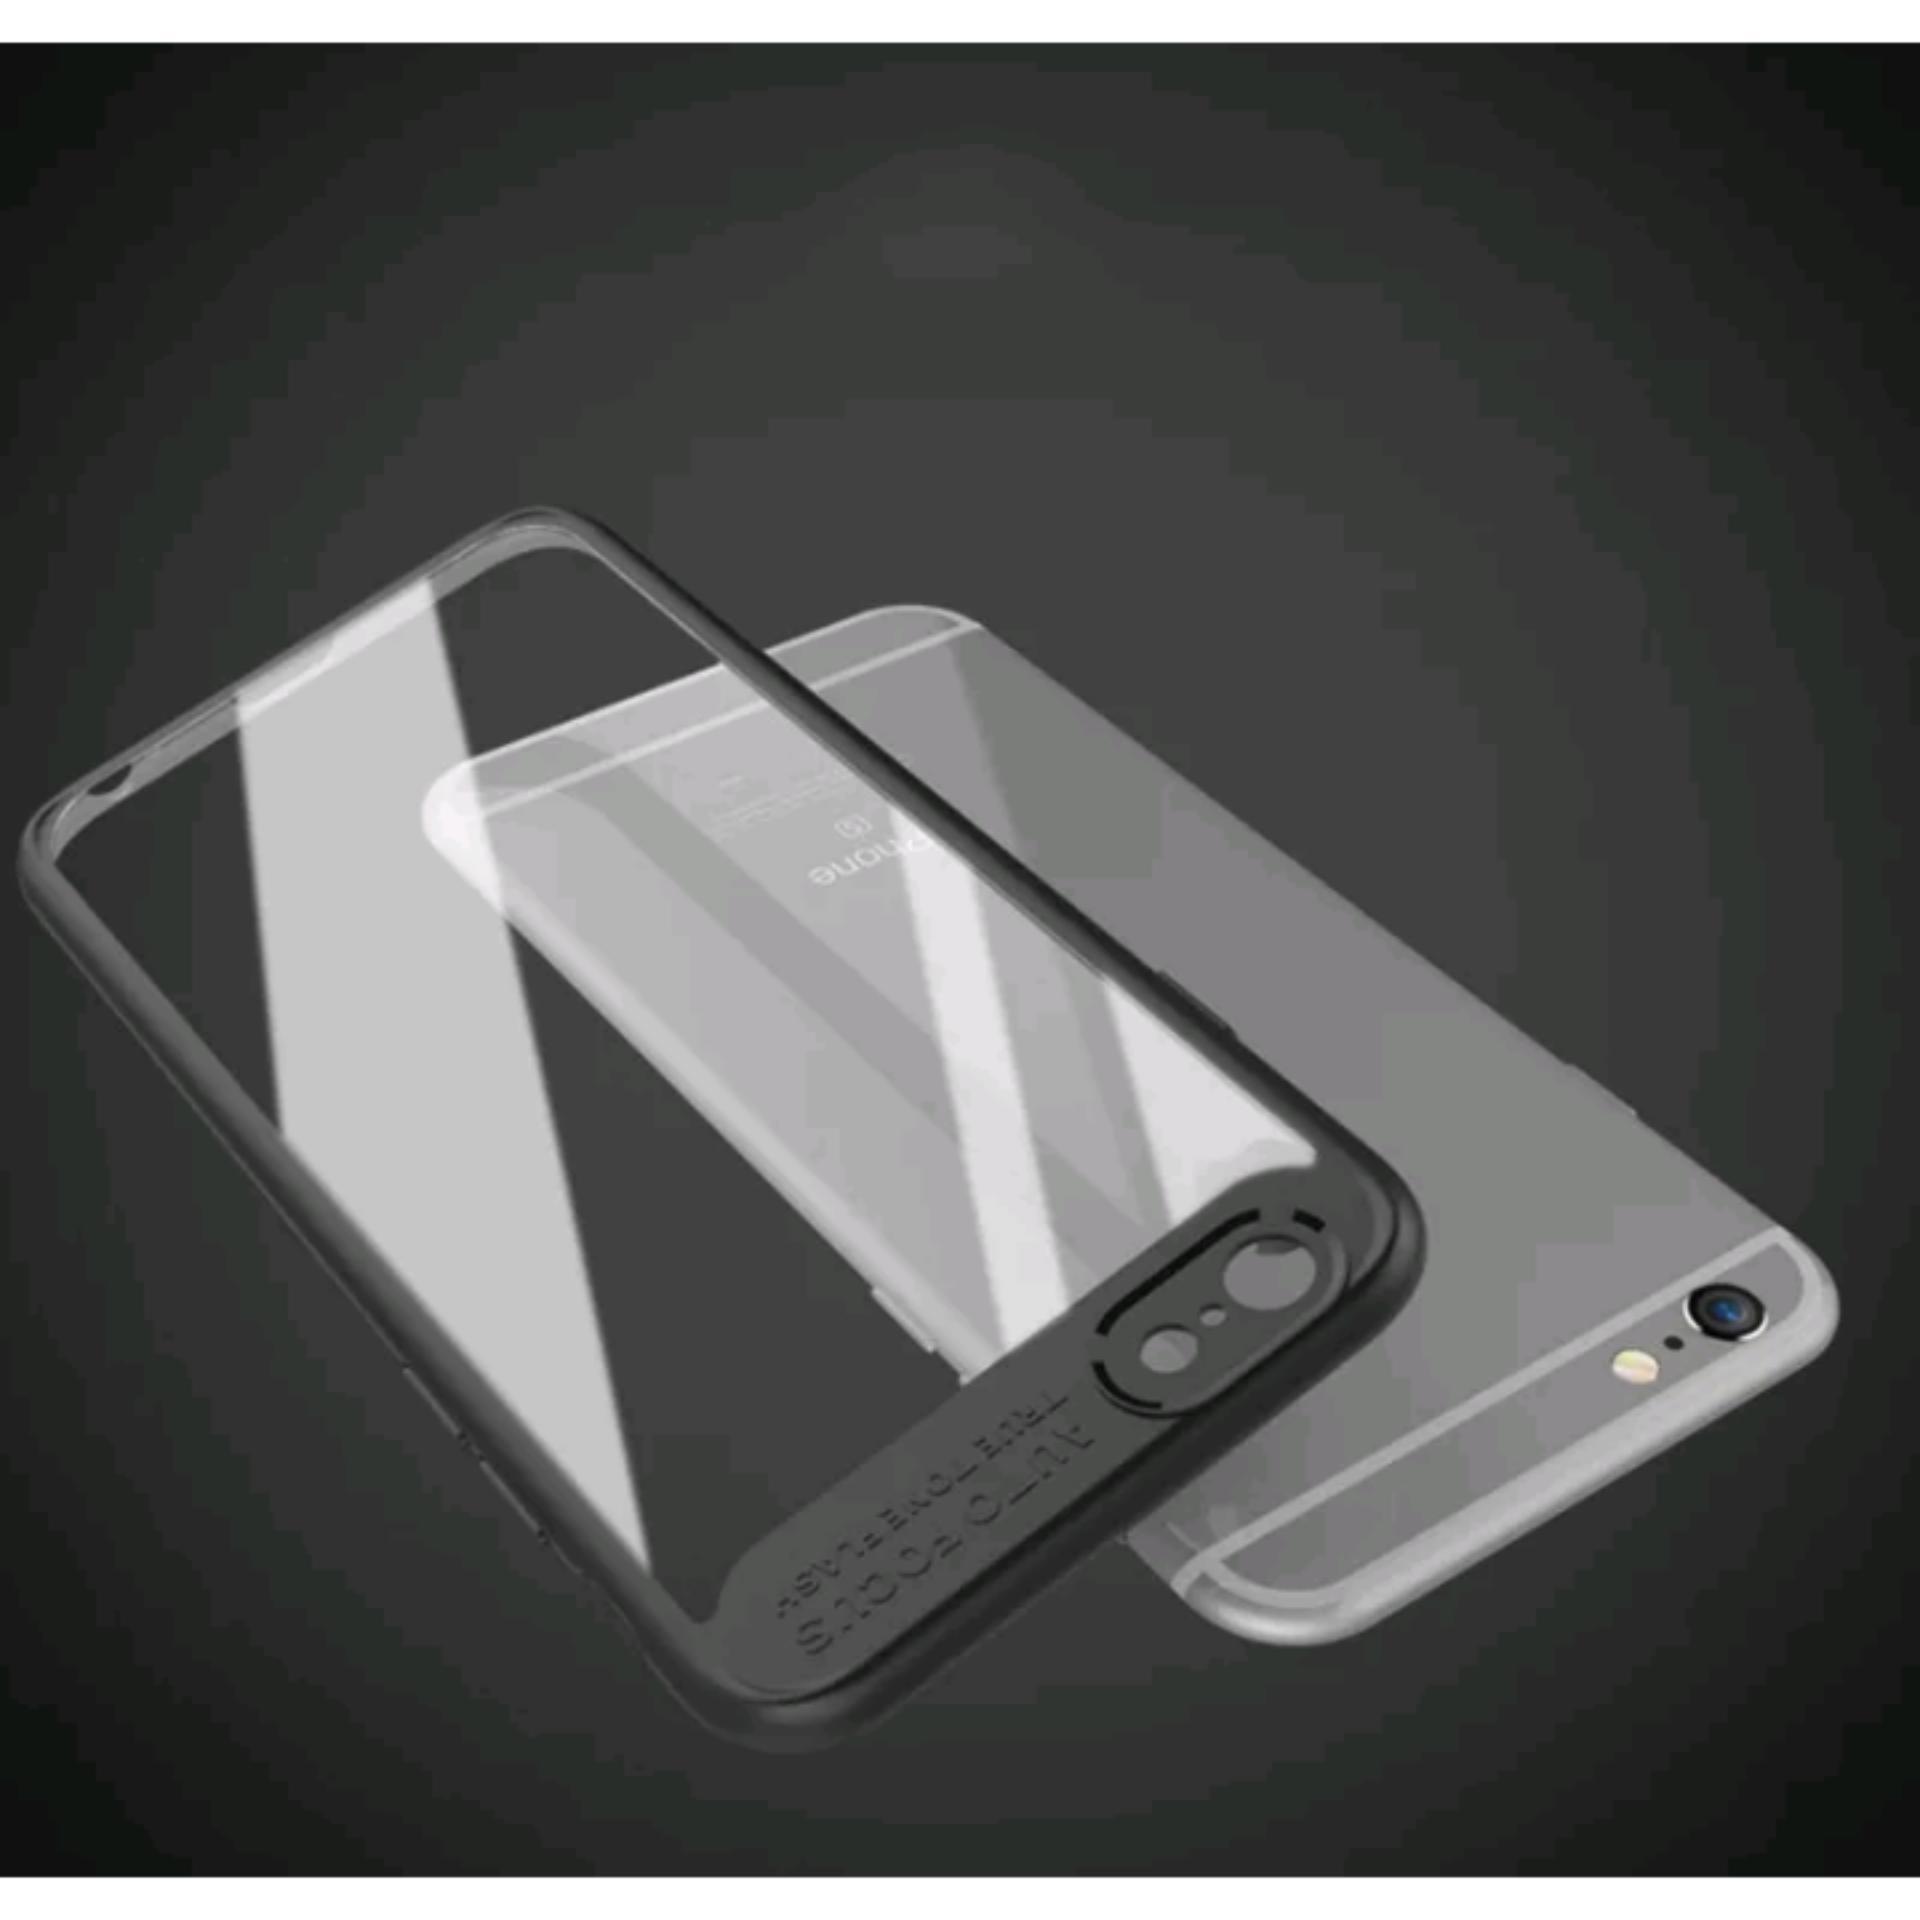 Calandiva Shockproof Hybrid Case For Iphone 7 47 Inch Hitam Daftar Dragon 6 Plus 6s 55